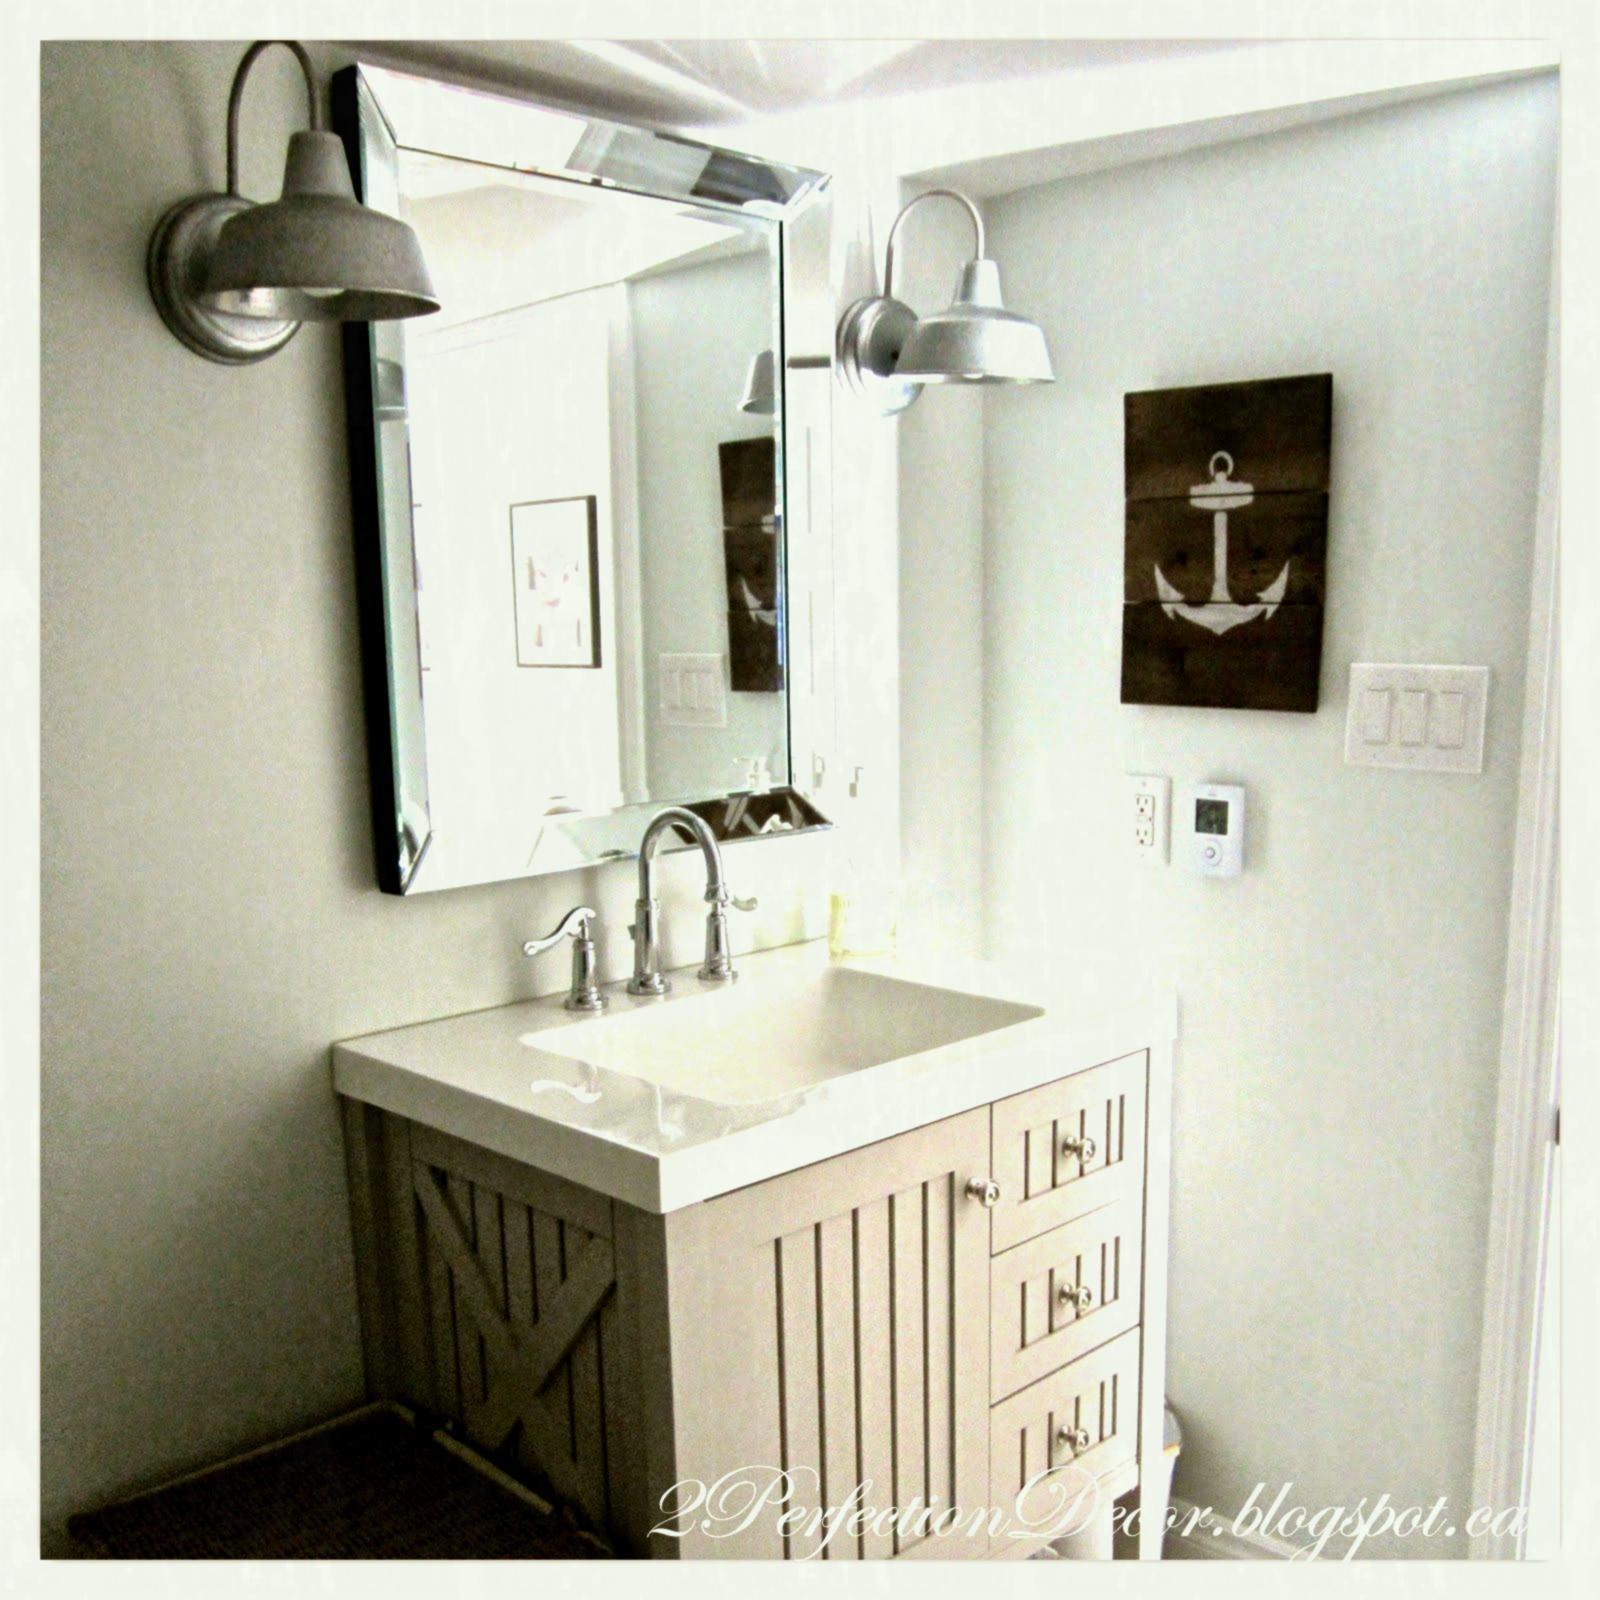 Bathroom Nautical Decor Furniture Wall Artcanada Target in Target Wall Art (Image 5 of 20)